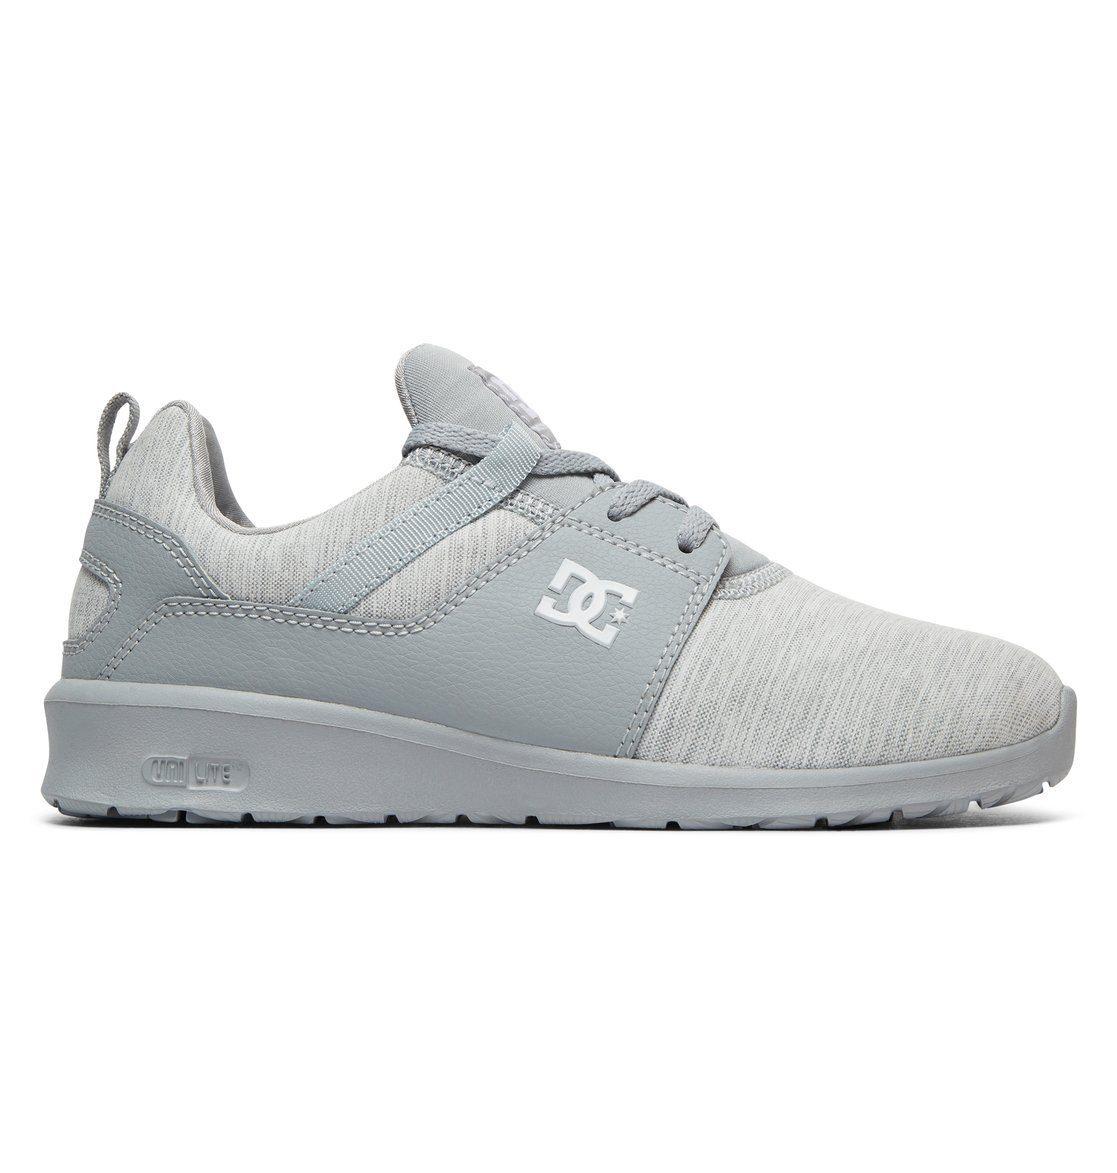 DC Shoes Schuhe Heathrow TX SE online kaufen  Grey#ft5_slash#grey#ft5_slash#grey